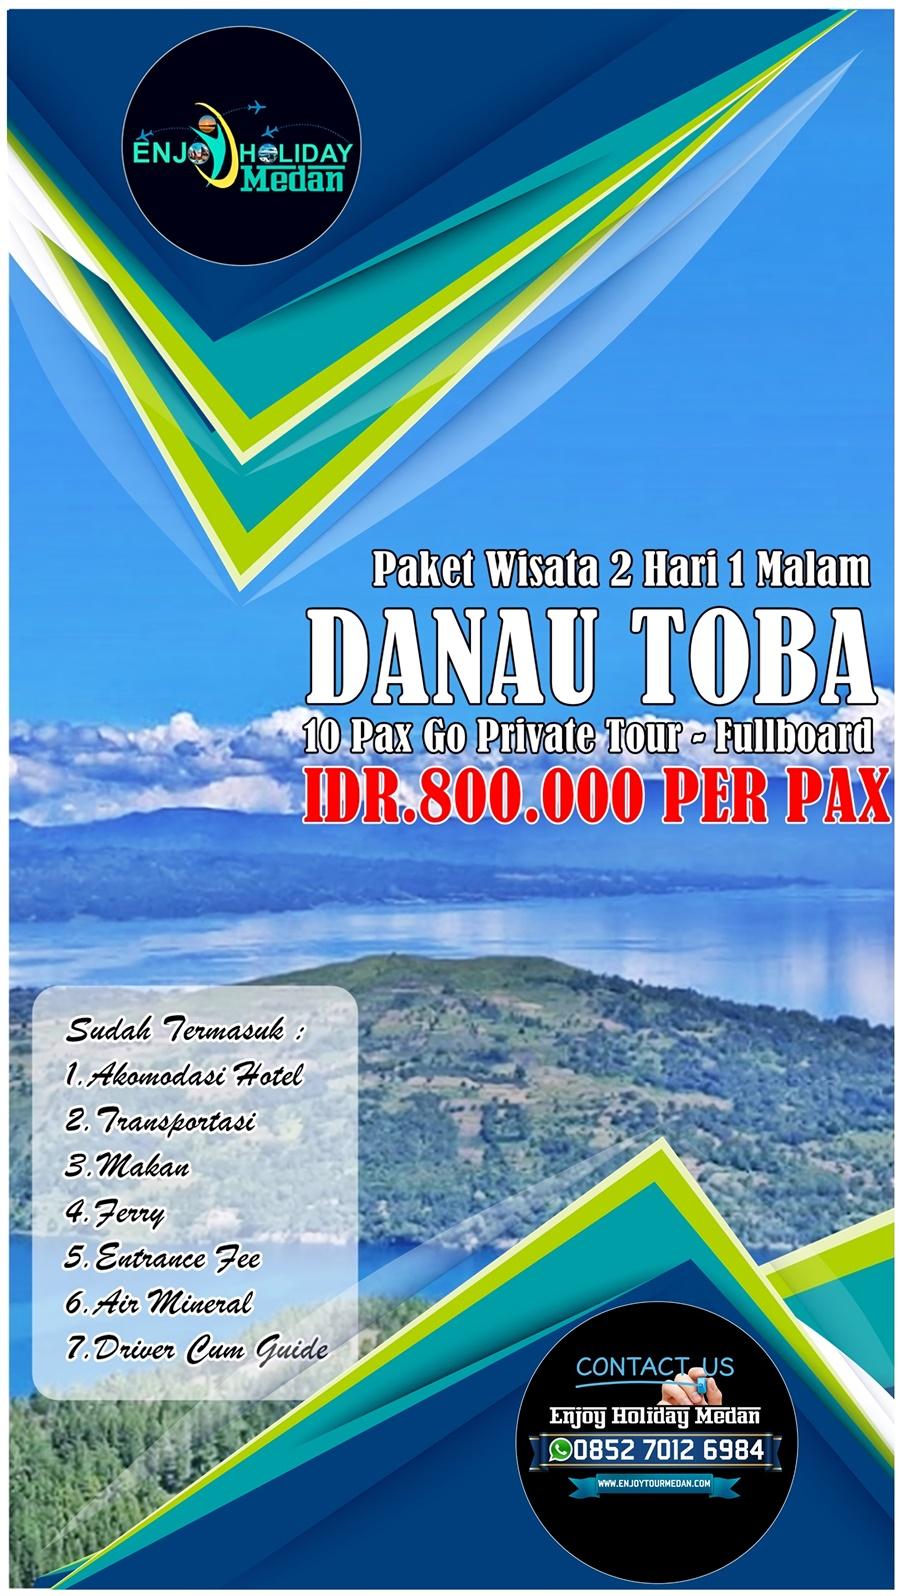 Danau Toba International Cottage Parapat